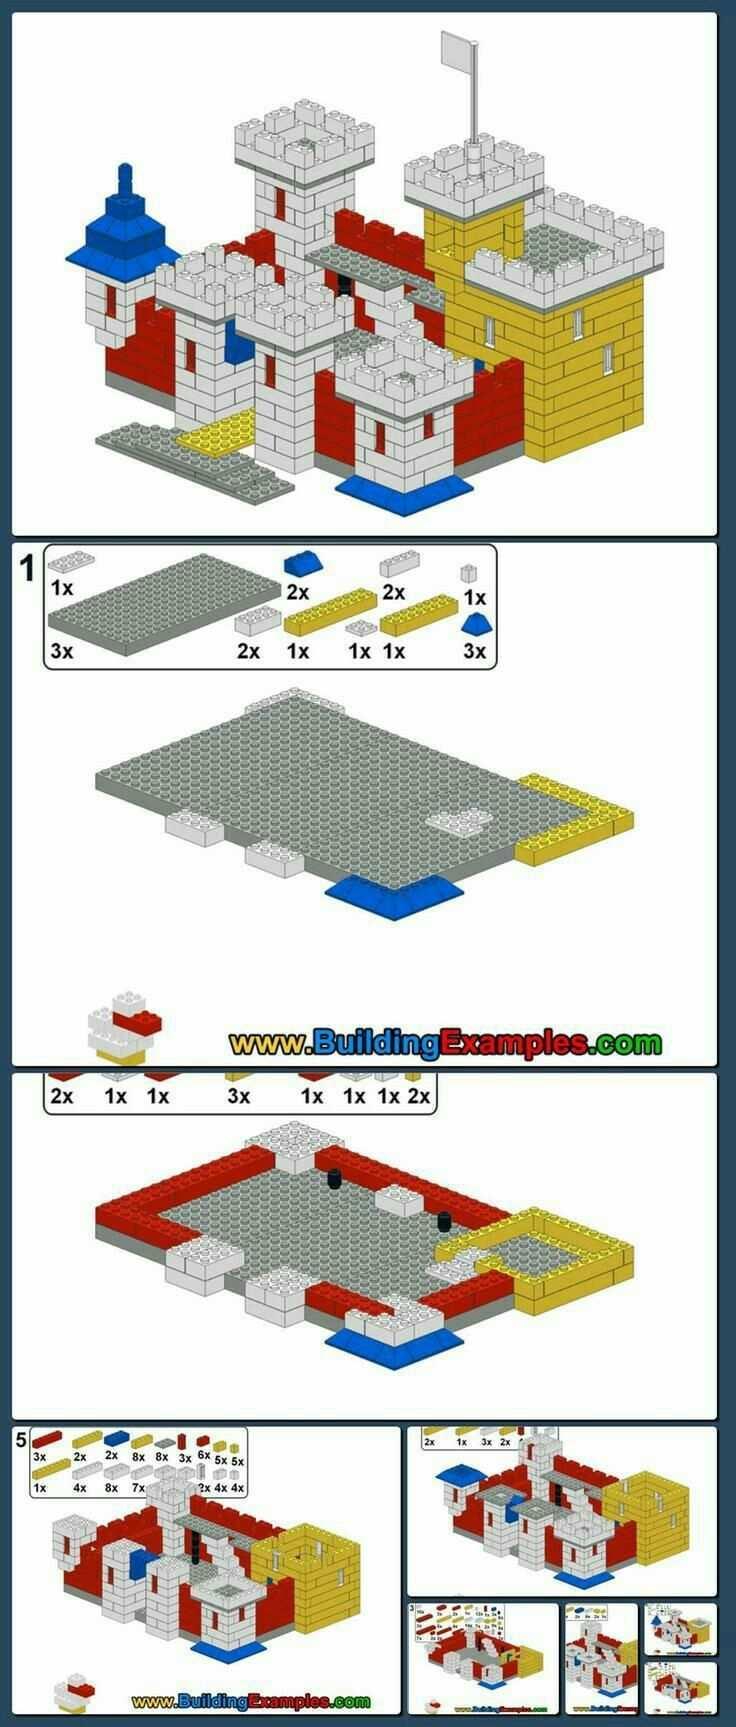 Pin By I B On Lego Instructions Lego For Kids Lego Craft Lego Diy